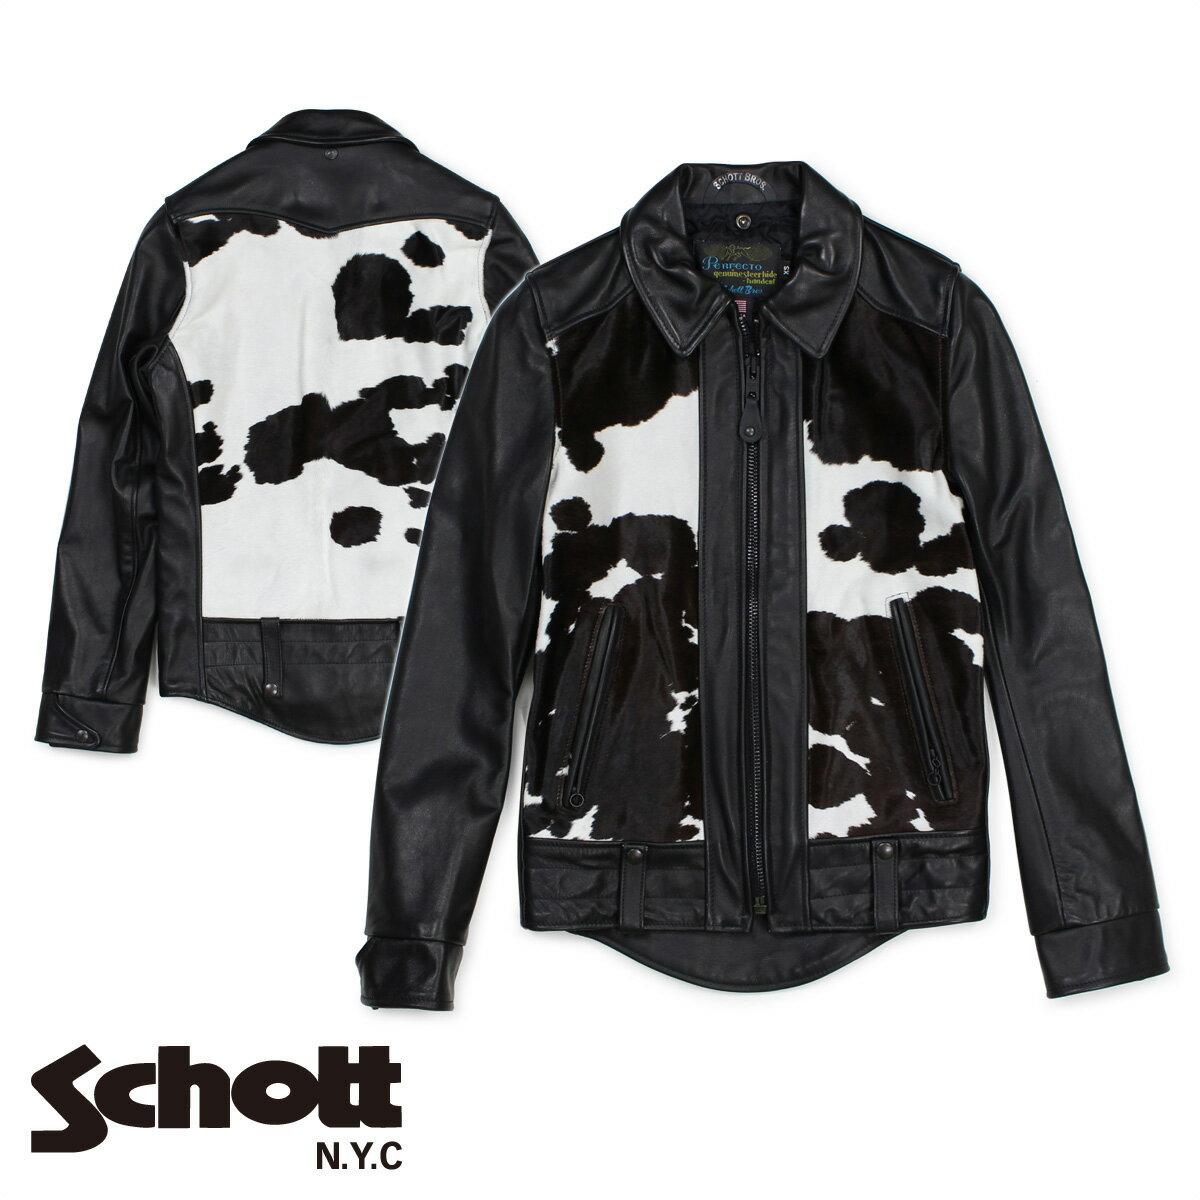 Schott EL CAMINO 50'S WEST COAST BIKER JACKET ショット ライダースジャケット ジャケット レザージャケット メンズ ブラック P6422 [1712]